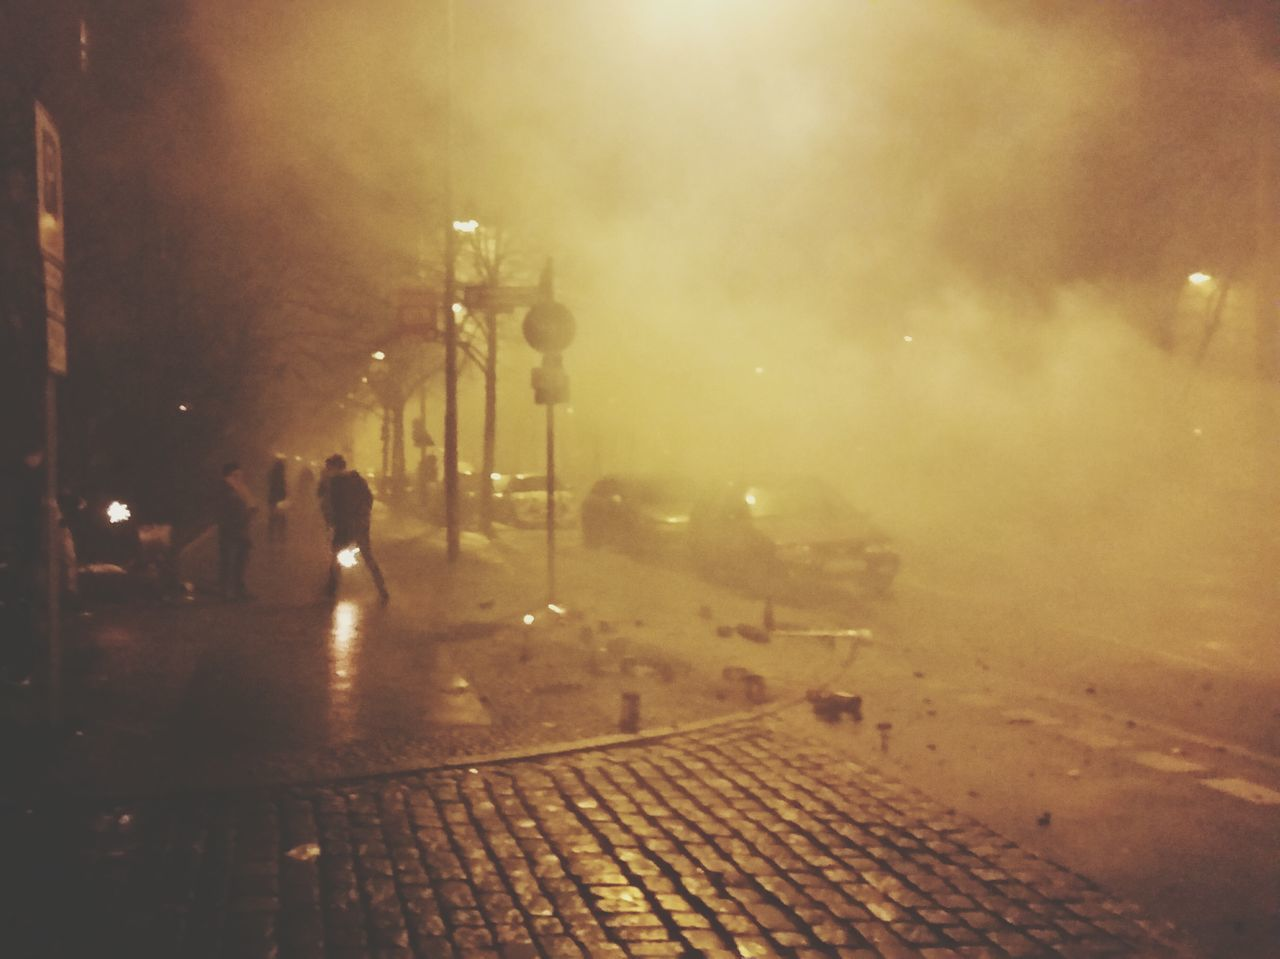 night, street, street light, illuminated, outdoors, city, one person, people